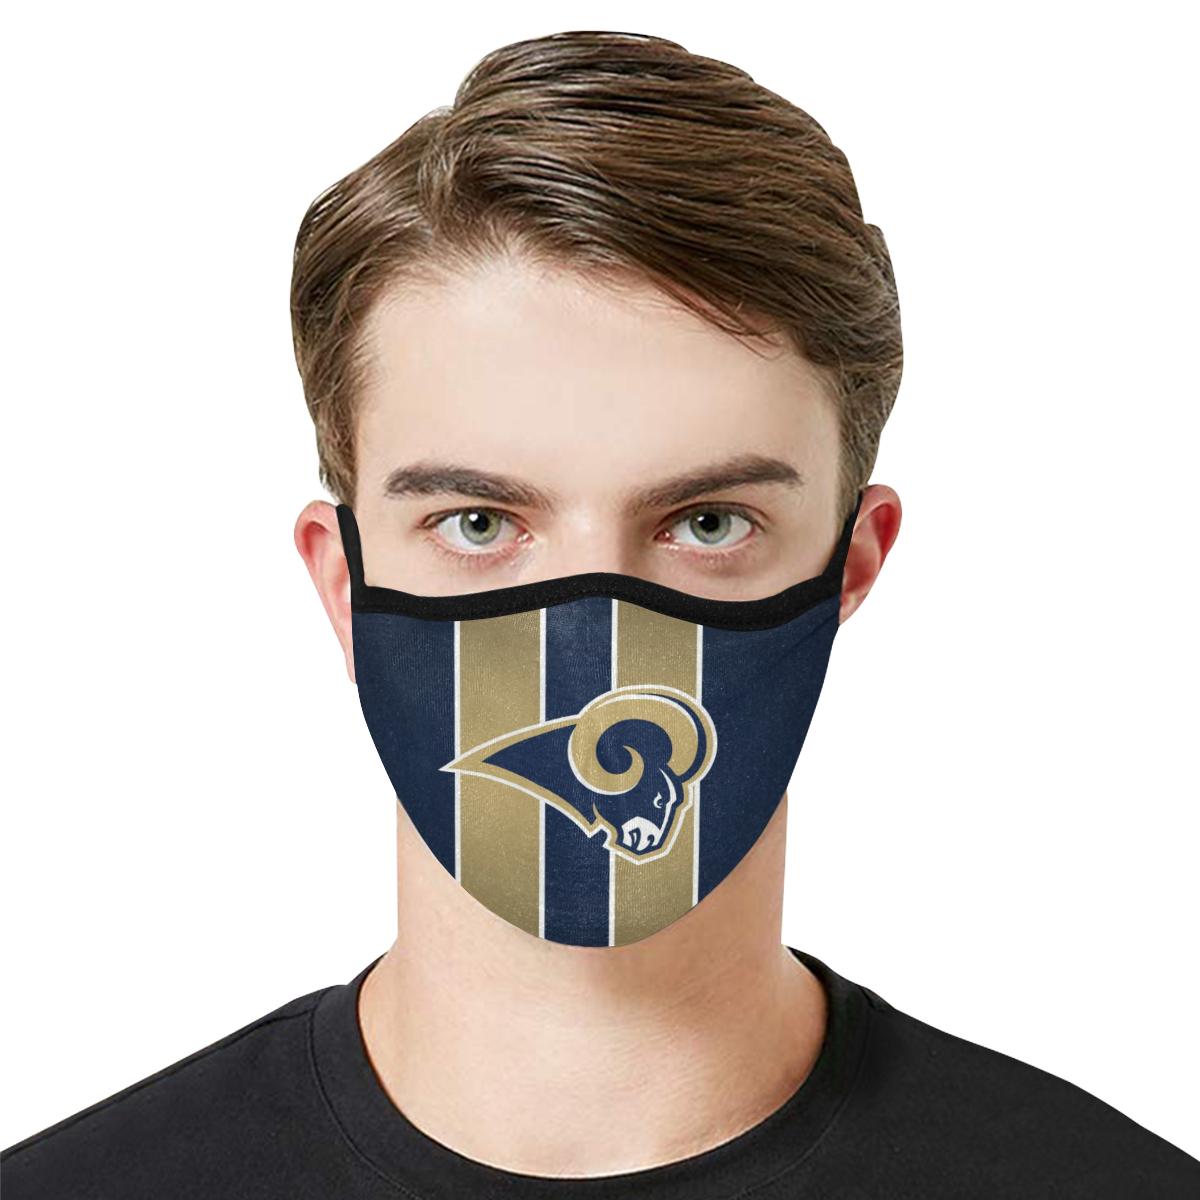 National football league los angeles rams cotton face mask 2